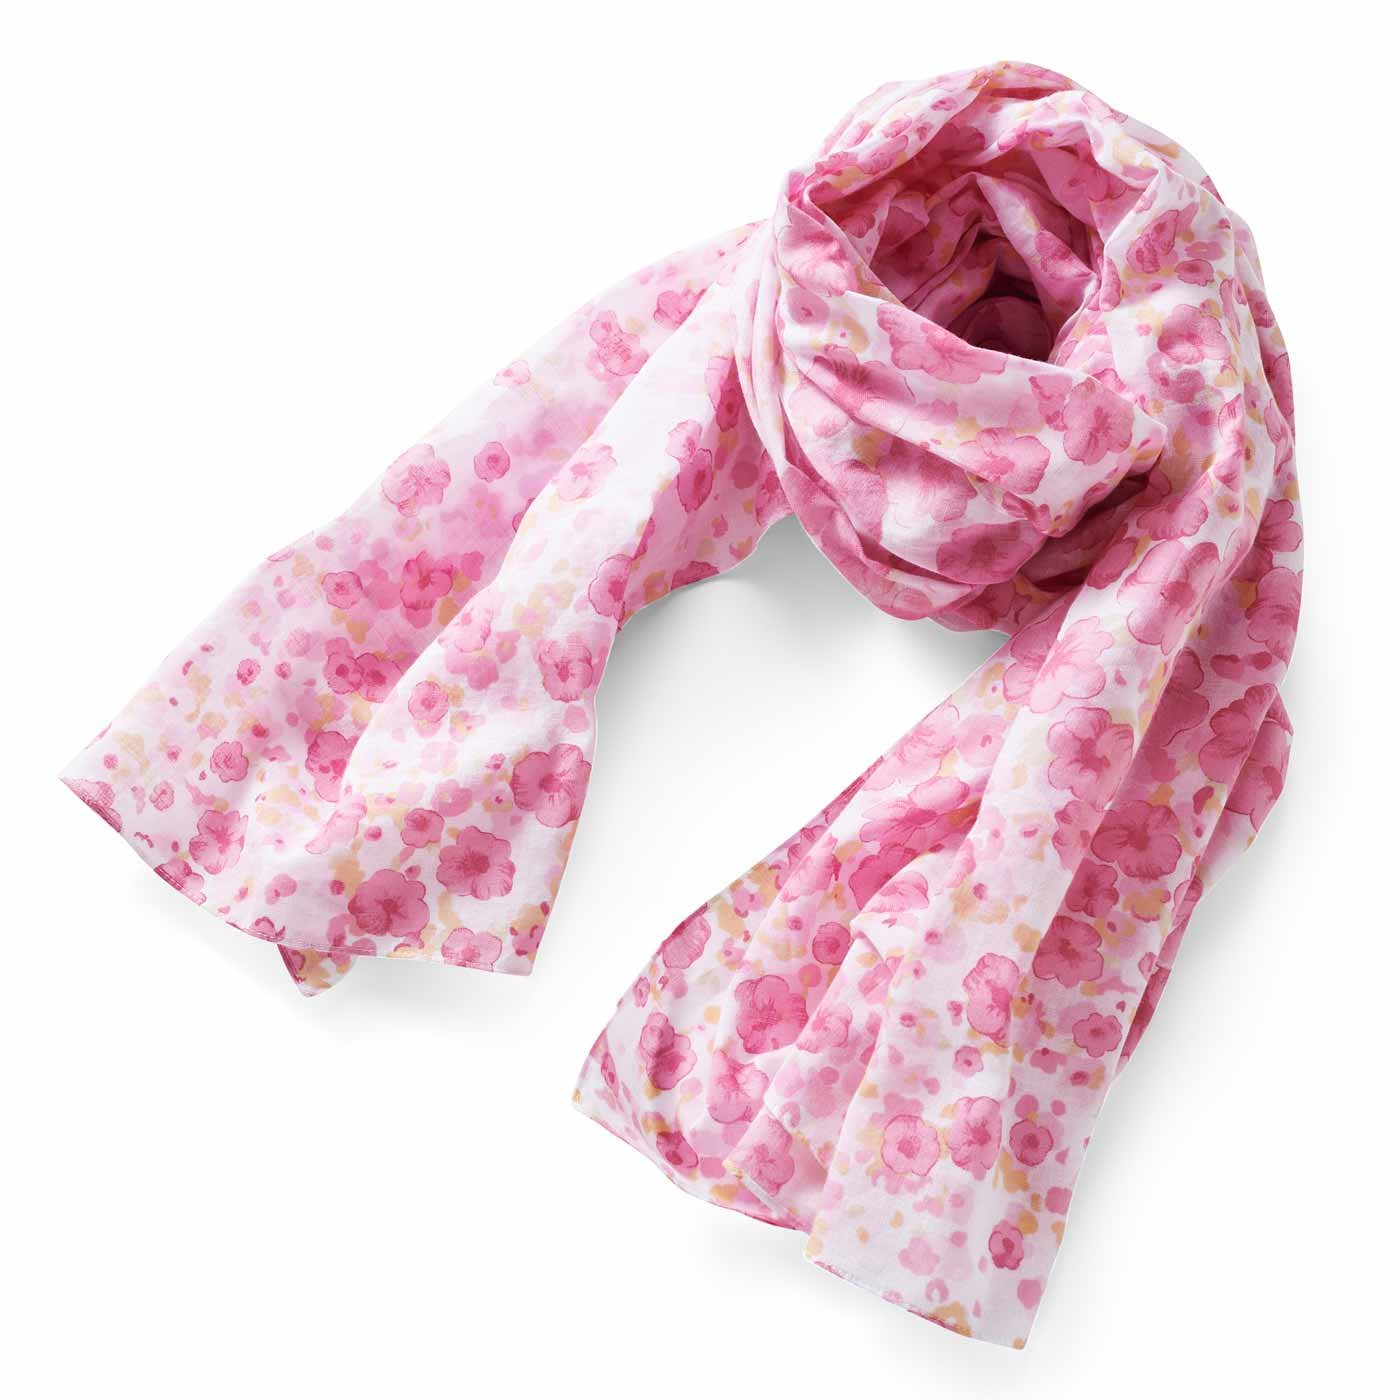 IEDIT[イディット] きれい色をふんわりまとう 超大判フラワーコットンストール〈ピンク〉